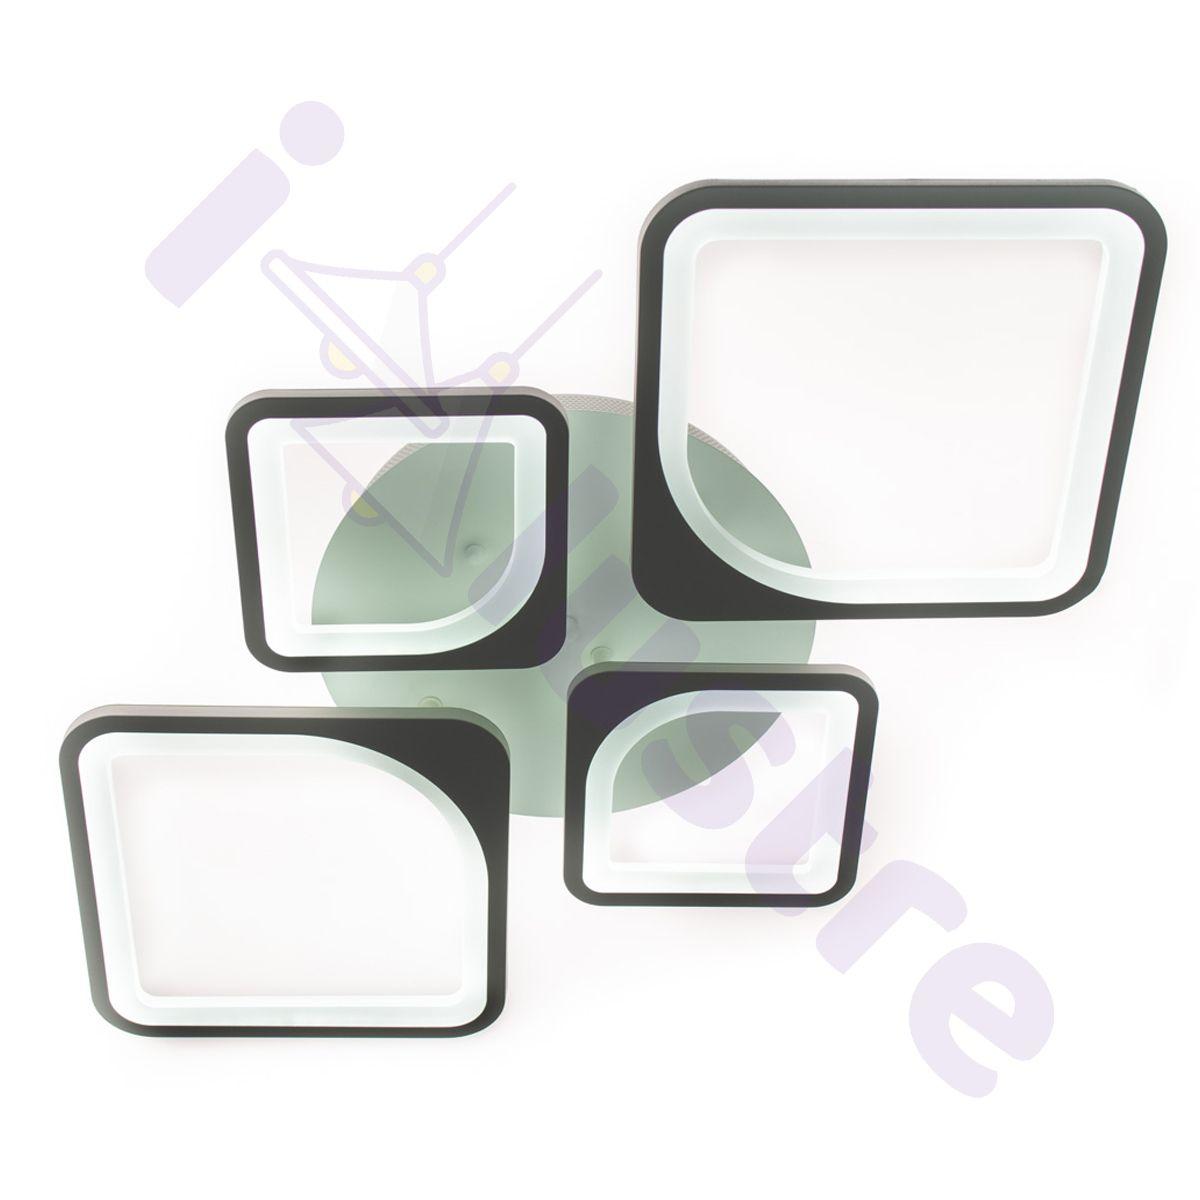 Plafoniera LED LEDO Light, Alb, Romb, LED 102W, Lumina Variabila, Dimabila, 6000 lm